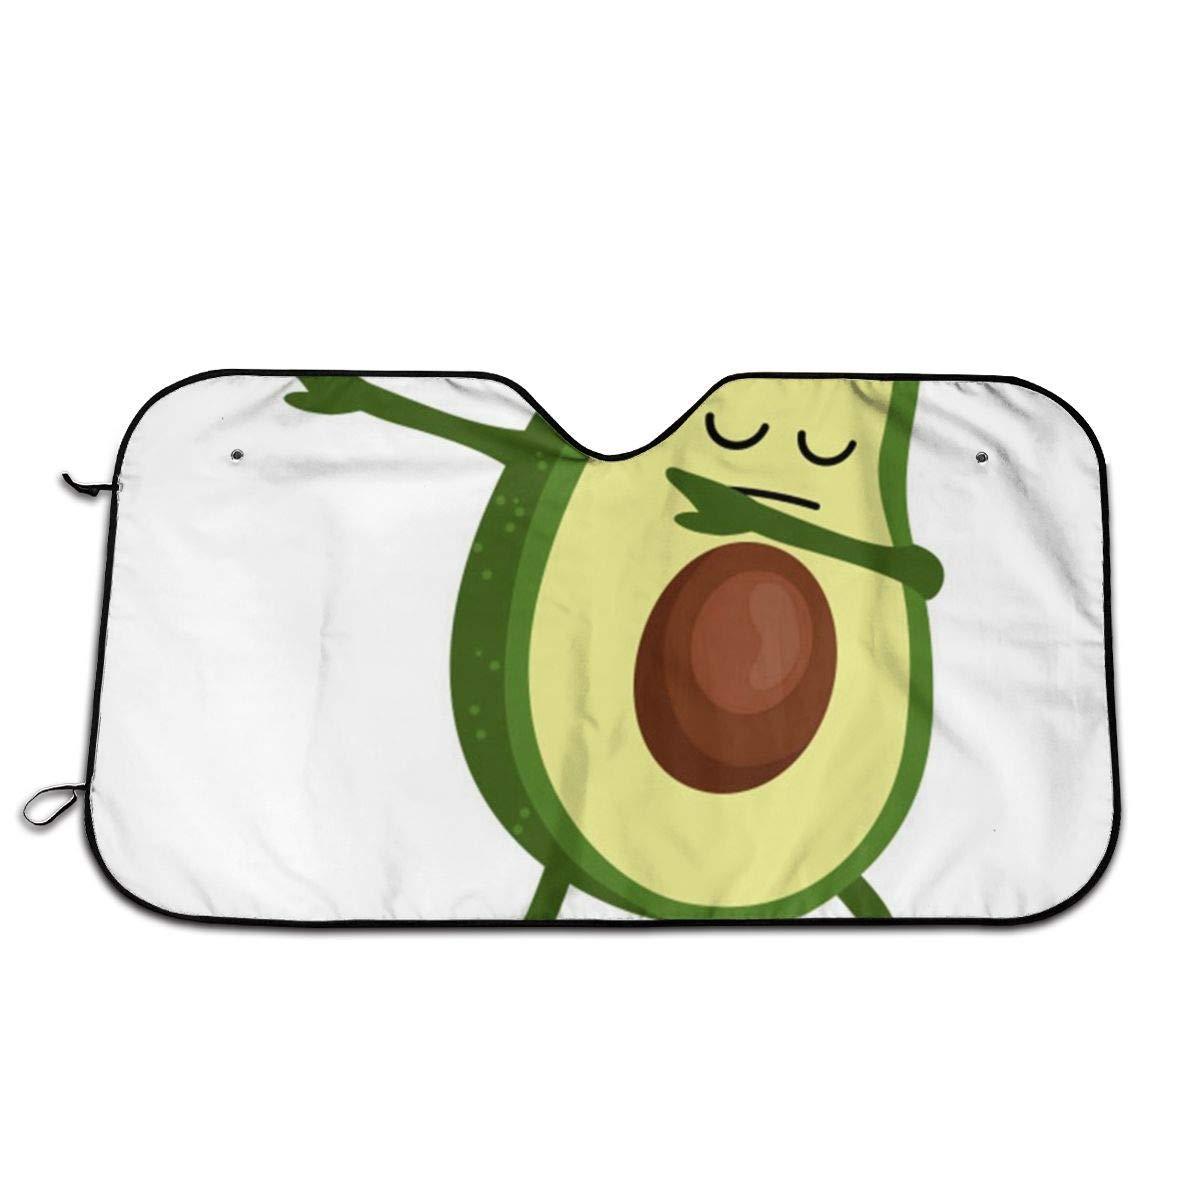 Avocado Green Food FunnyWindshield Sun Shade Car Windows UV Ray Reflector Outdoor Vehicle Accessories by ChanFi